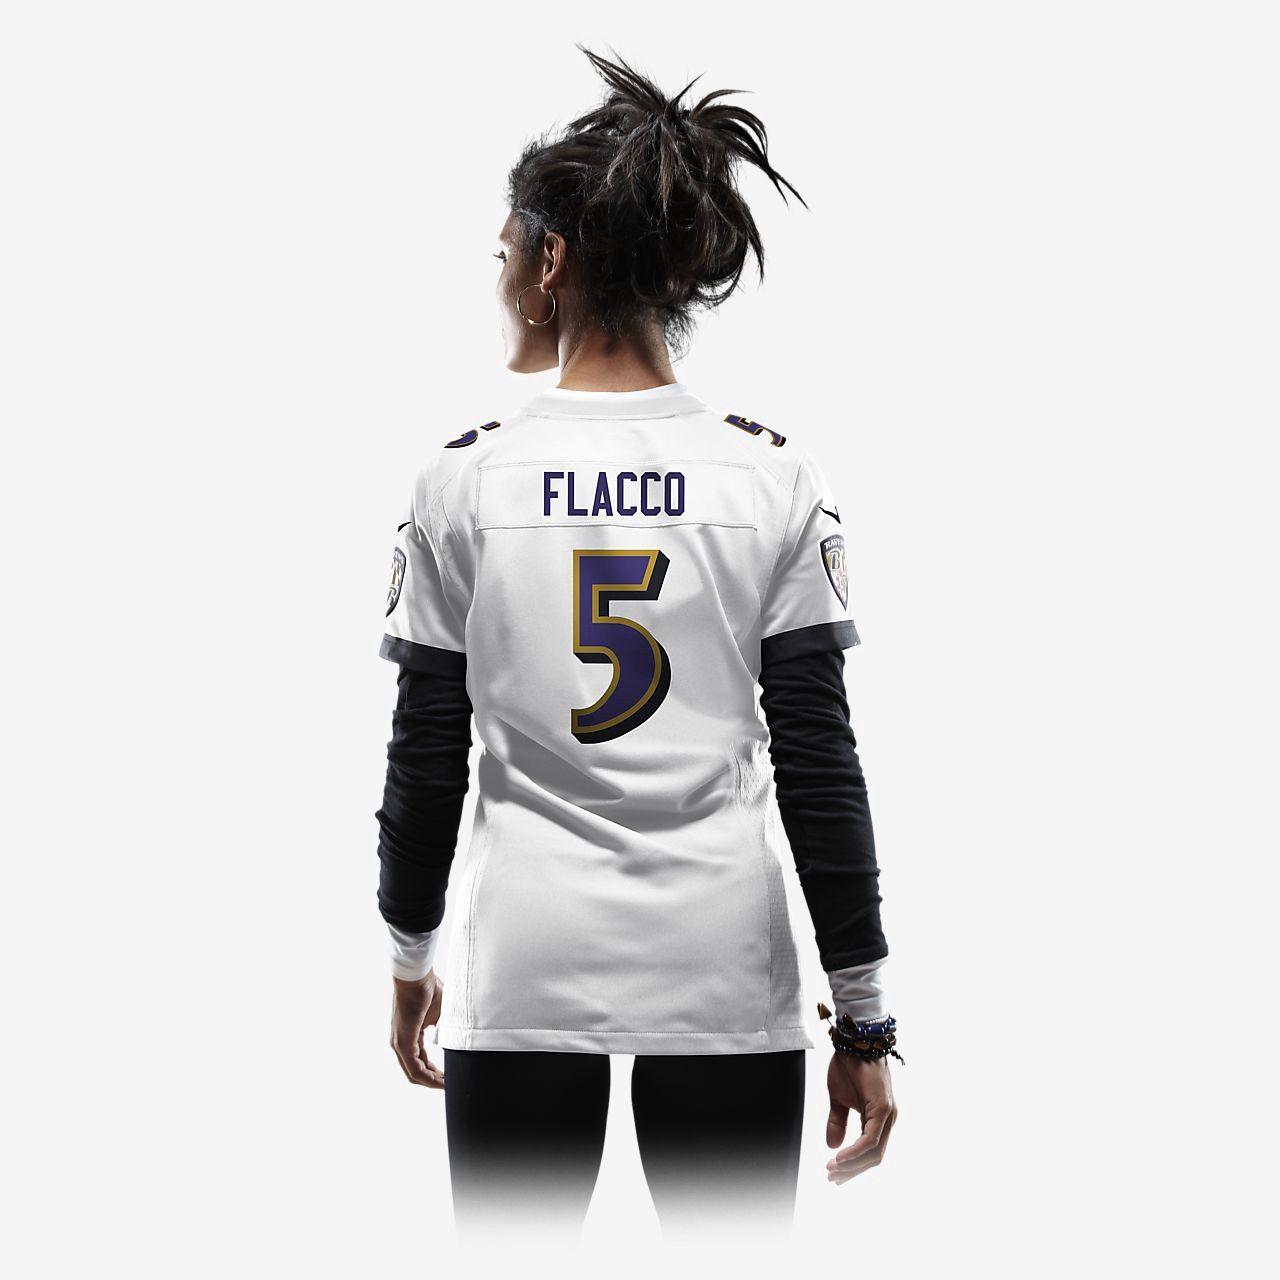 Nike Nfl Baltimore Ravens (Joe Flacco) Womens Football Away Game Jersey - M  ravens 3b0bc4da4